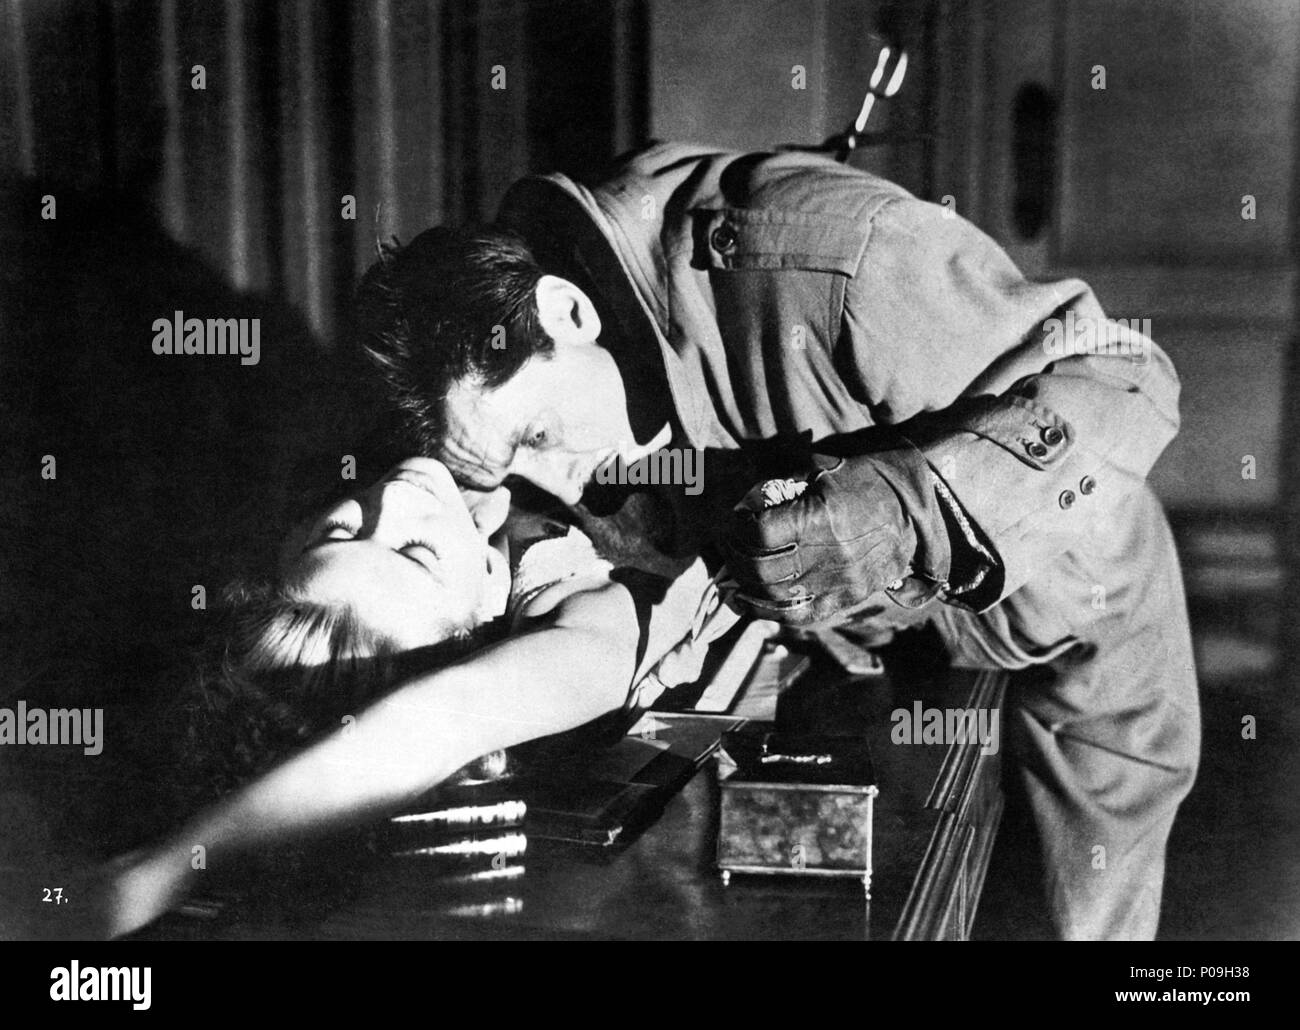 1d822a5b16b4 Original Film Title  DIAL M FOR MURDER. English Title  DIAL M FOR MURDER.  Film Director  ALFRED HITCHCOCK. Year  1954. Stars  ANTHONY DAWSON  GRACE  KELLY.